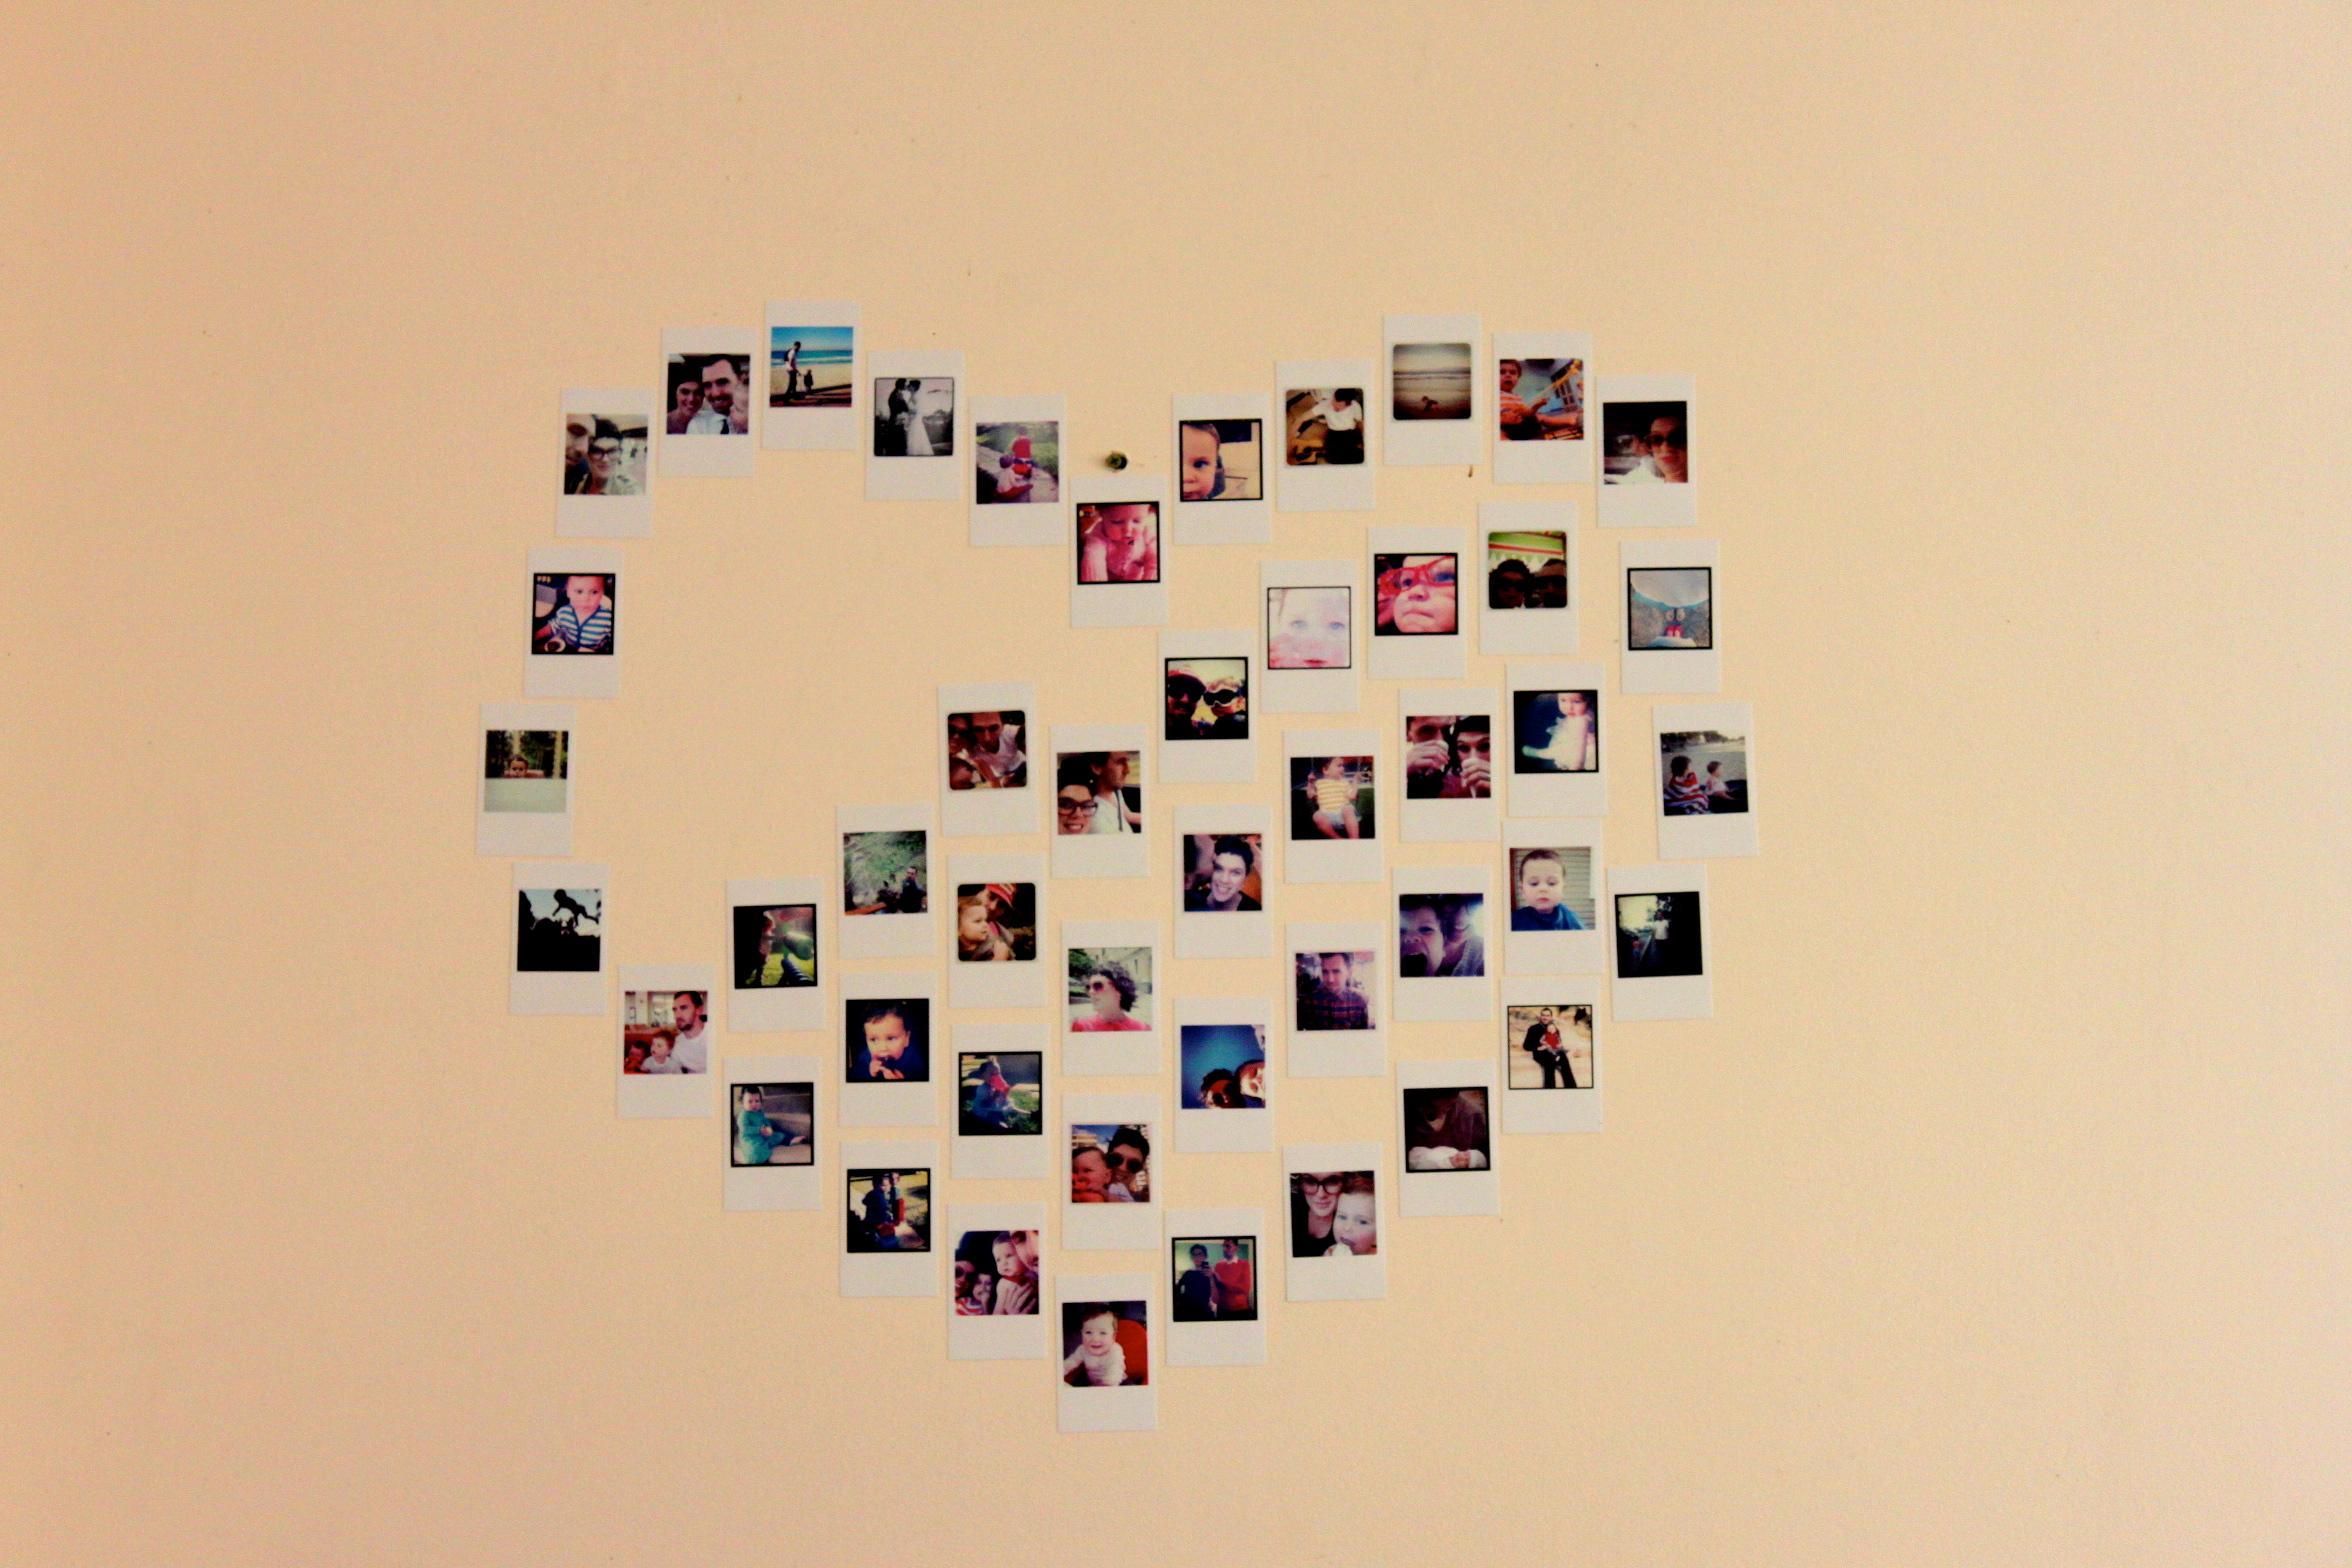 Diy Heart Photo Collage Eachpeachpear